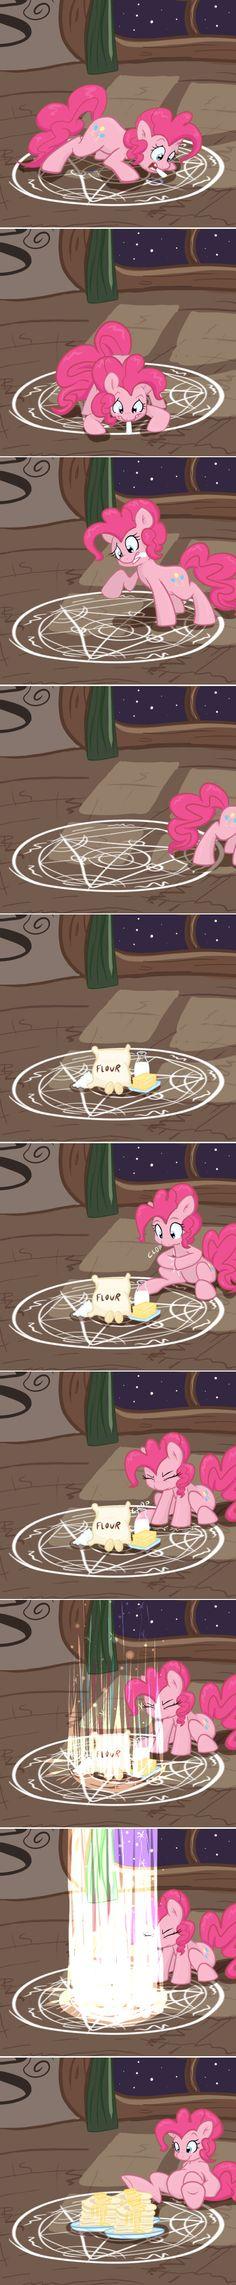 Bruh i thought she was makin a demon trap, not using alchemy, full metal alchemiy's pinkie pie :) Pinkie Pie, Fullmetal Alchemist, Mlp Memes, Little Poni, Mlp Comics, My Little Pony Comic, Mlp Fan Art, Mlp Pony, My Little Pony Friendship